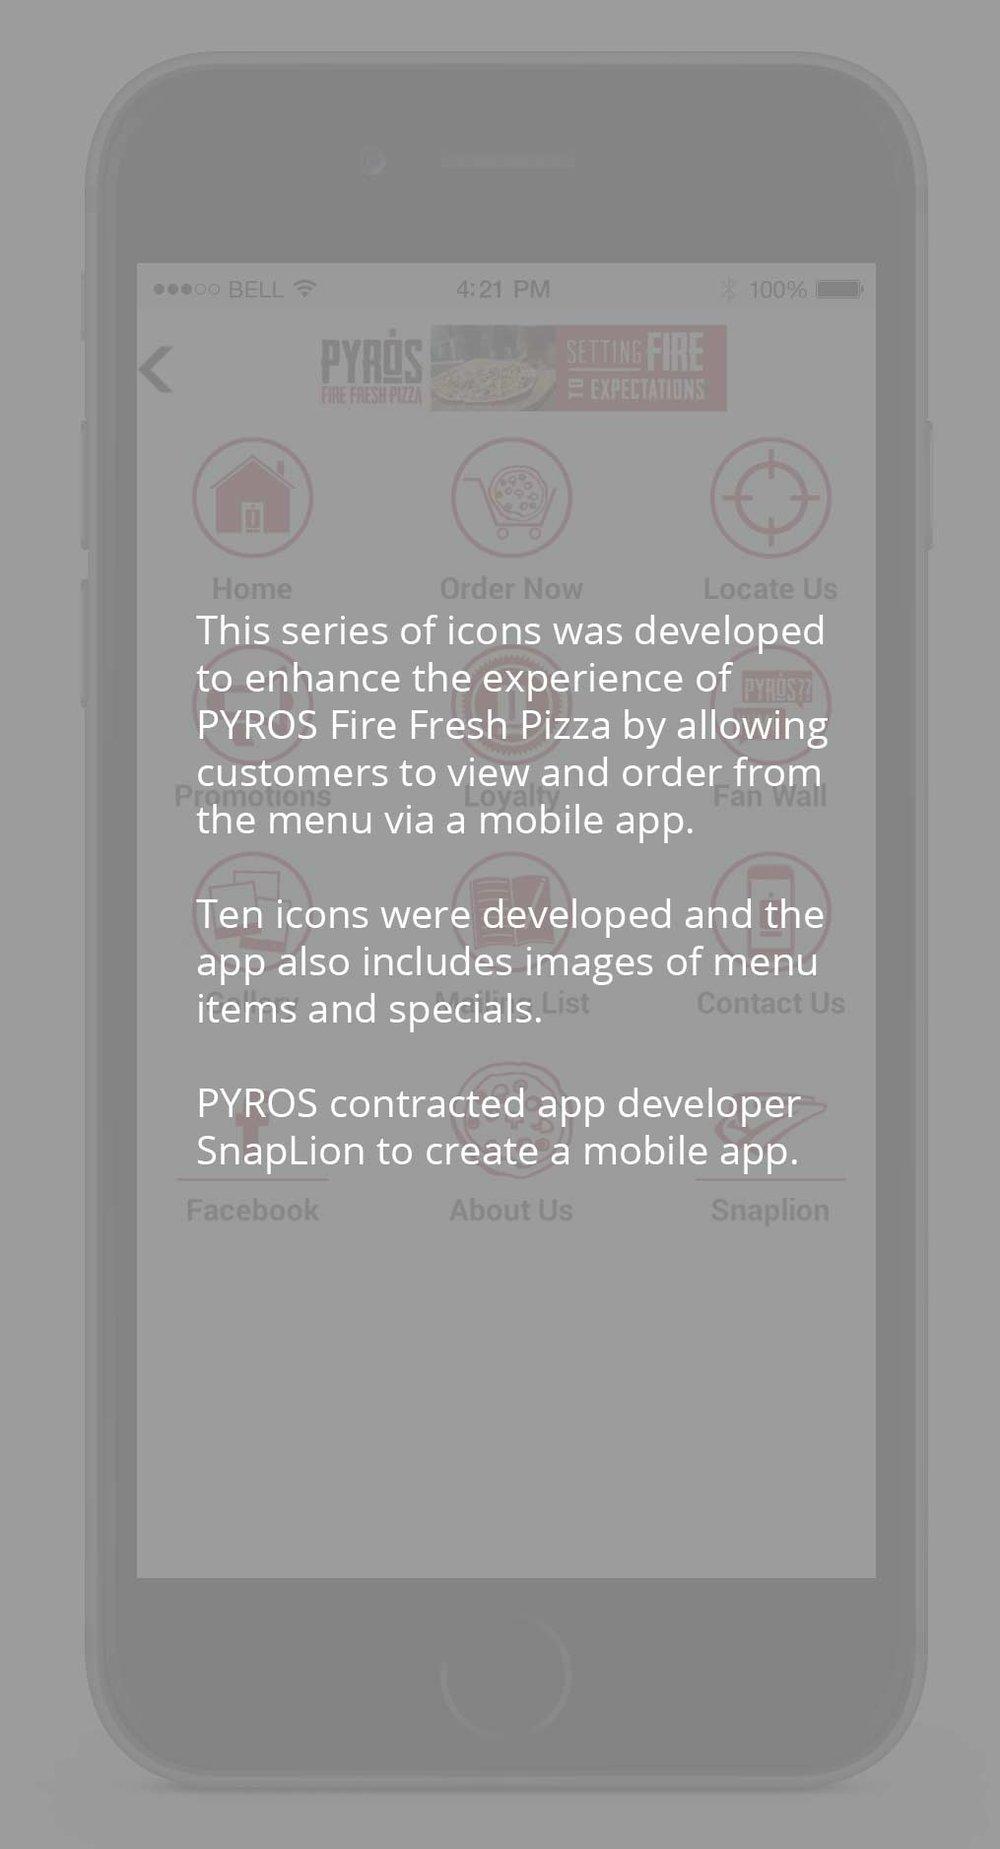 052_pyros-app-02.jpg